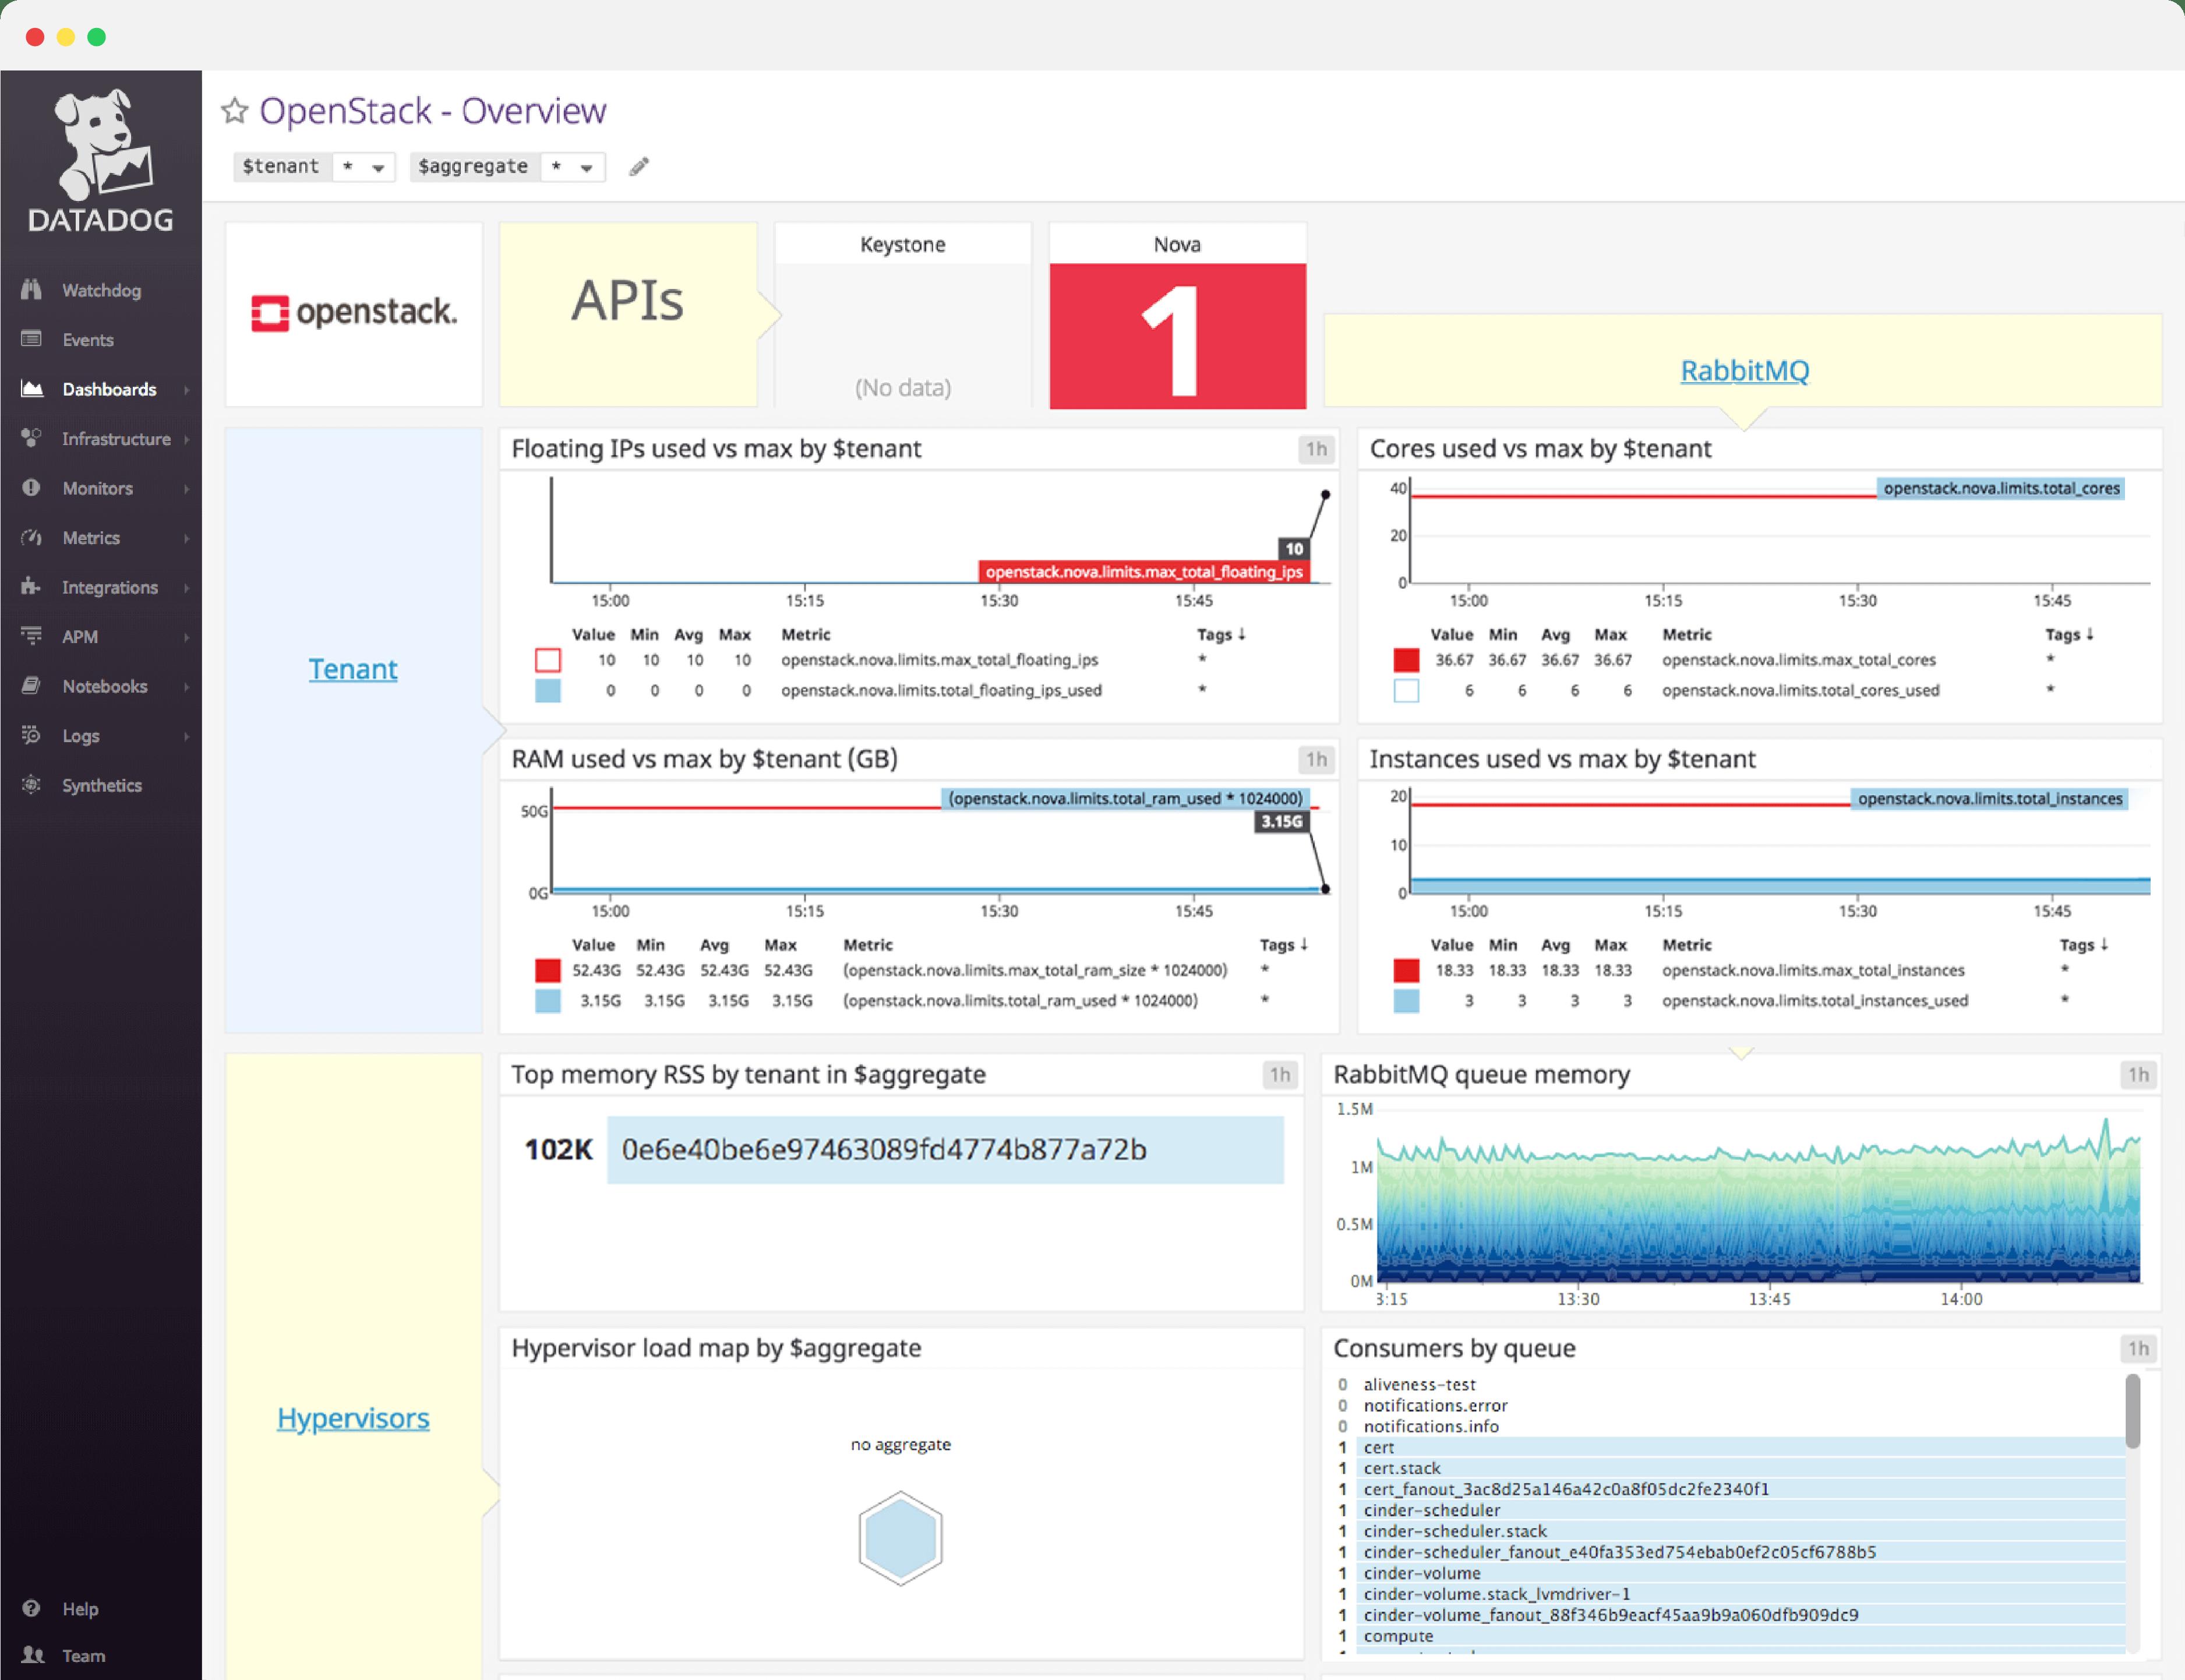 dashboard/dashboard-header-openstackv2.png